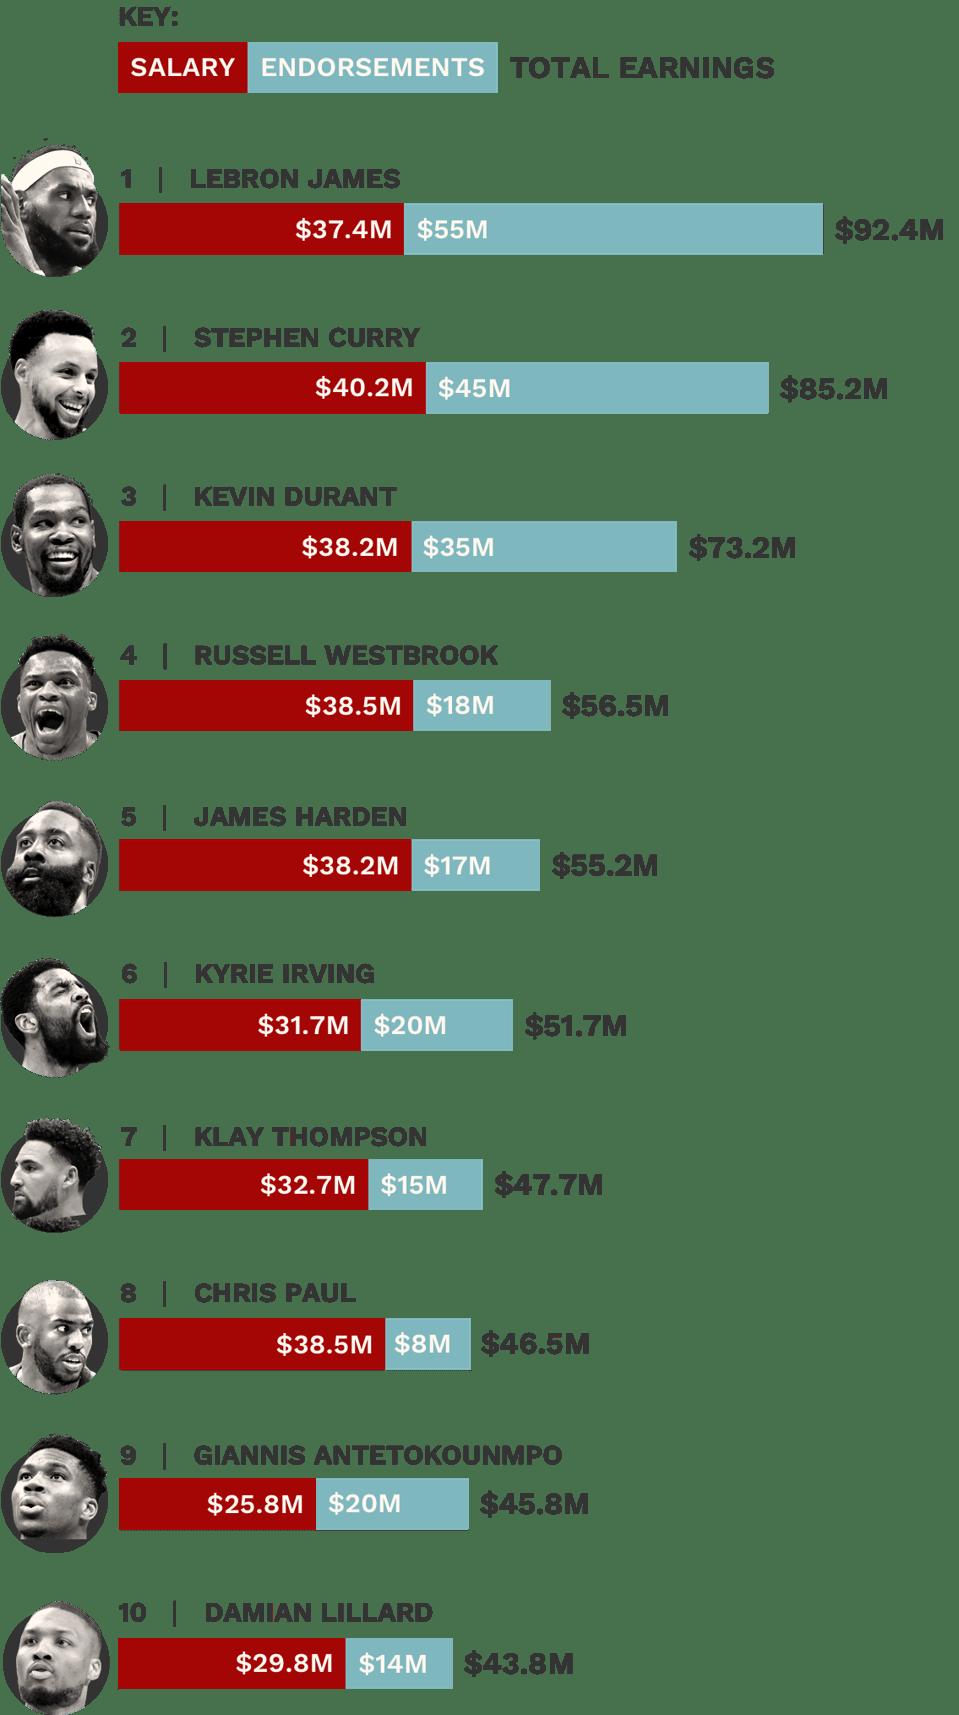 The Highest-Paid NBA Players - Dataviz